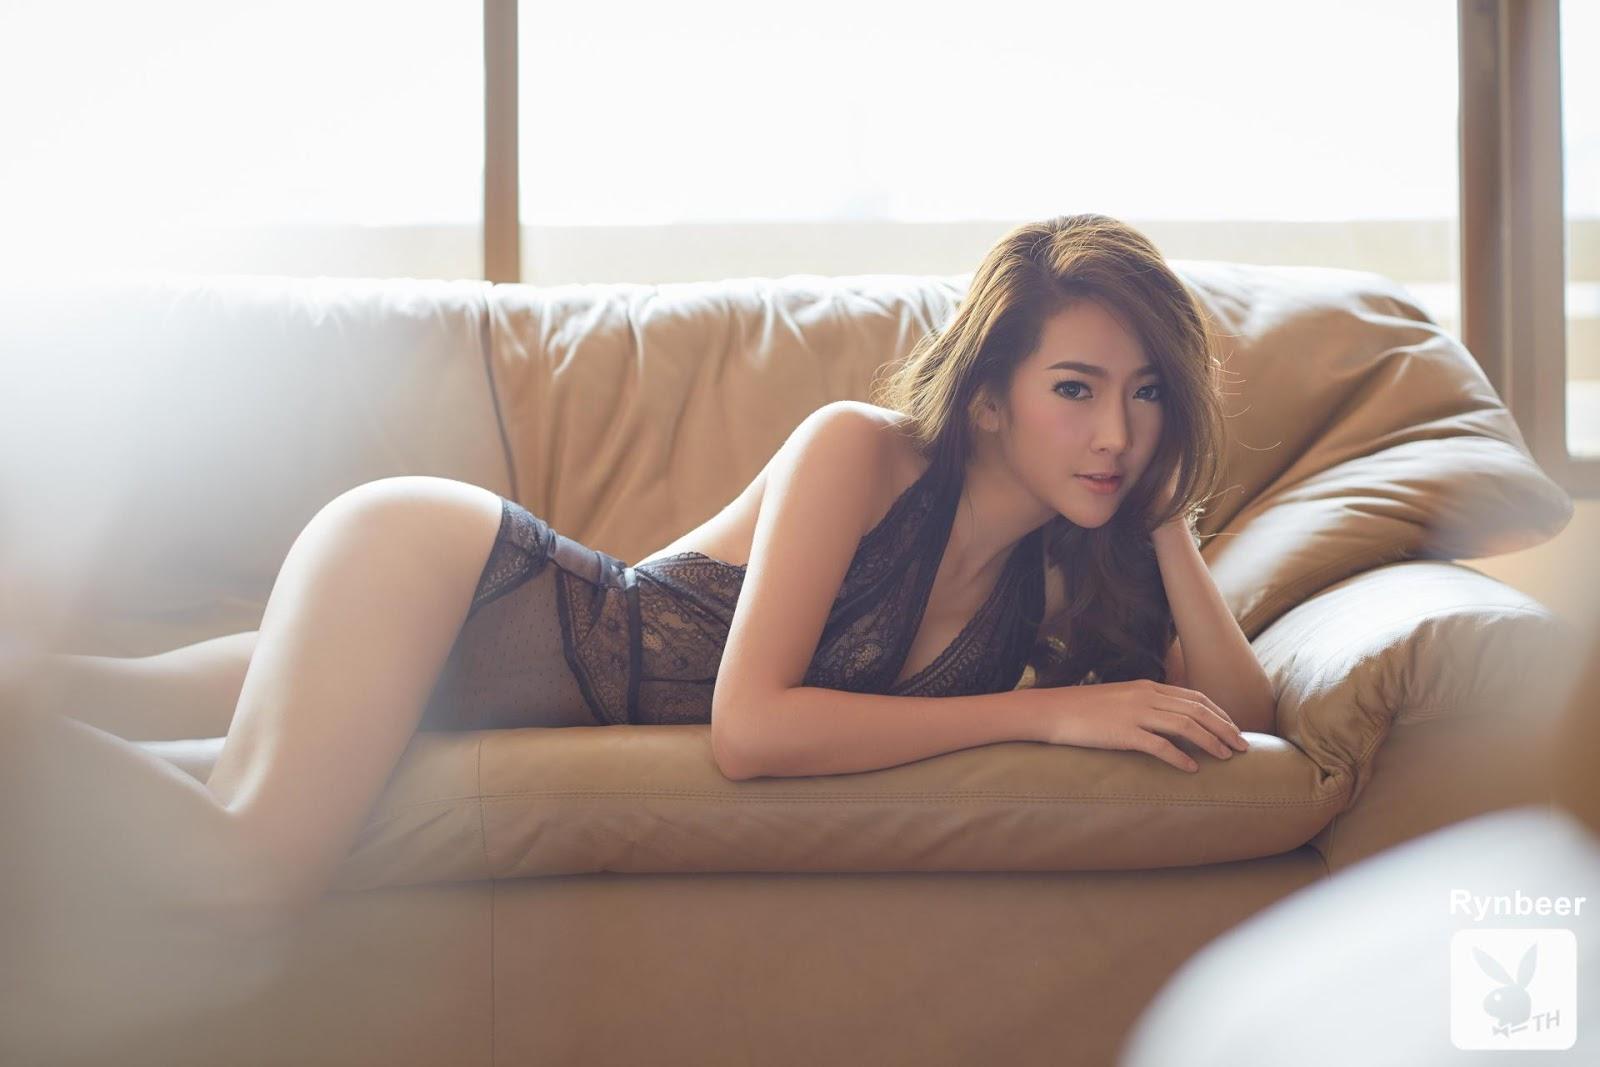 Nude adult cams video silvia